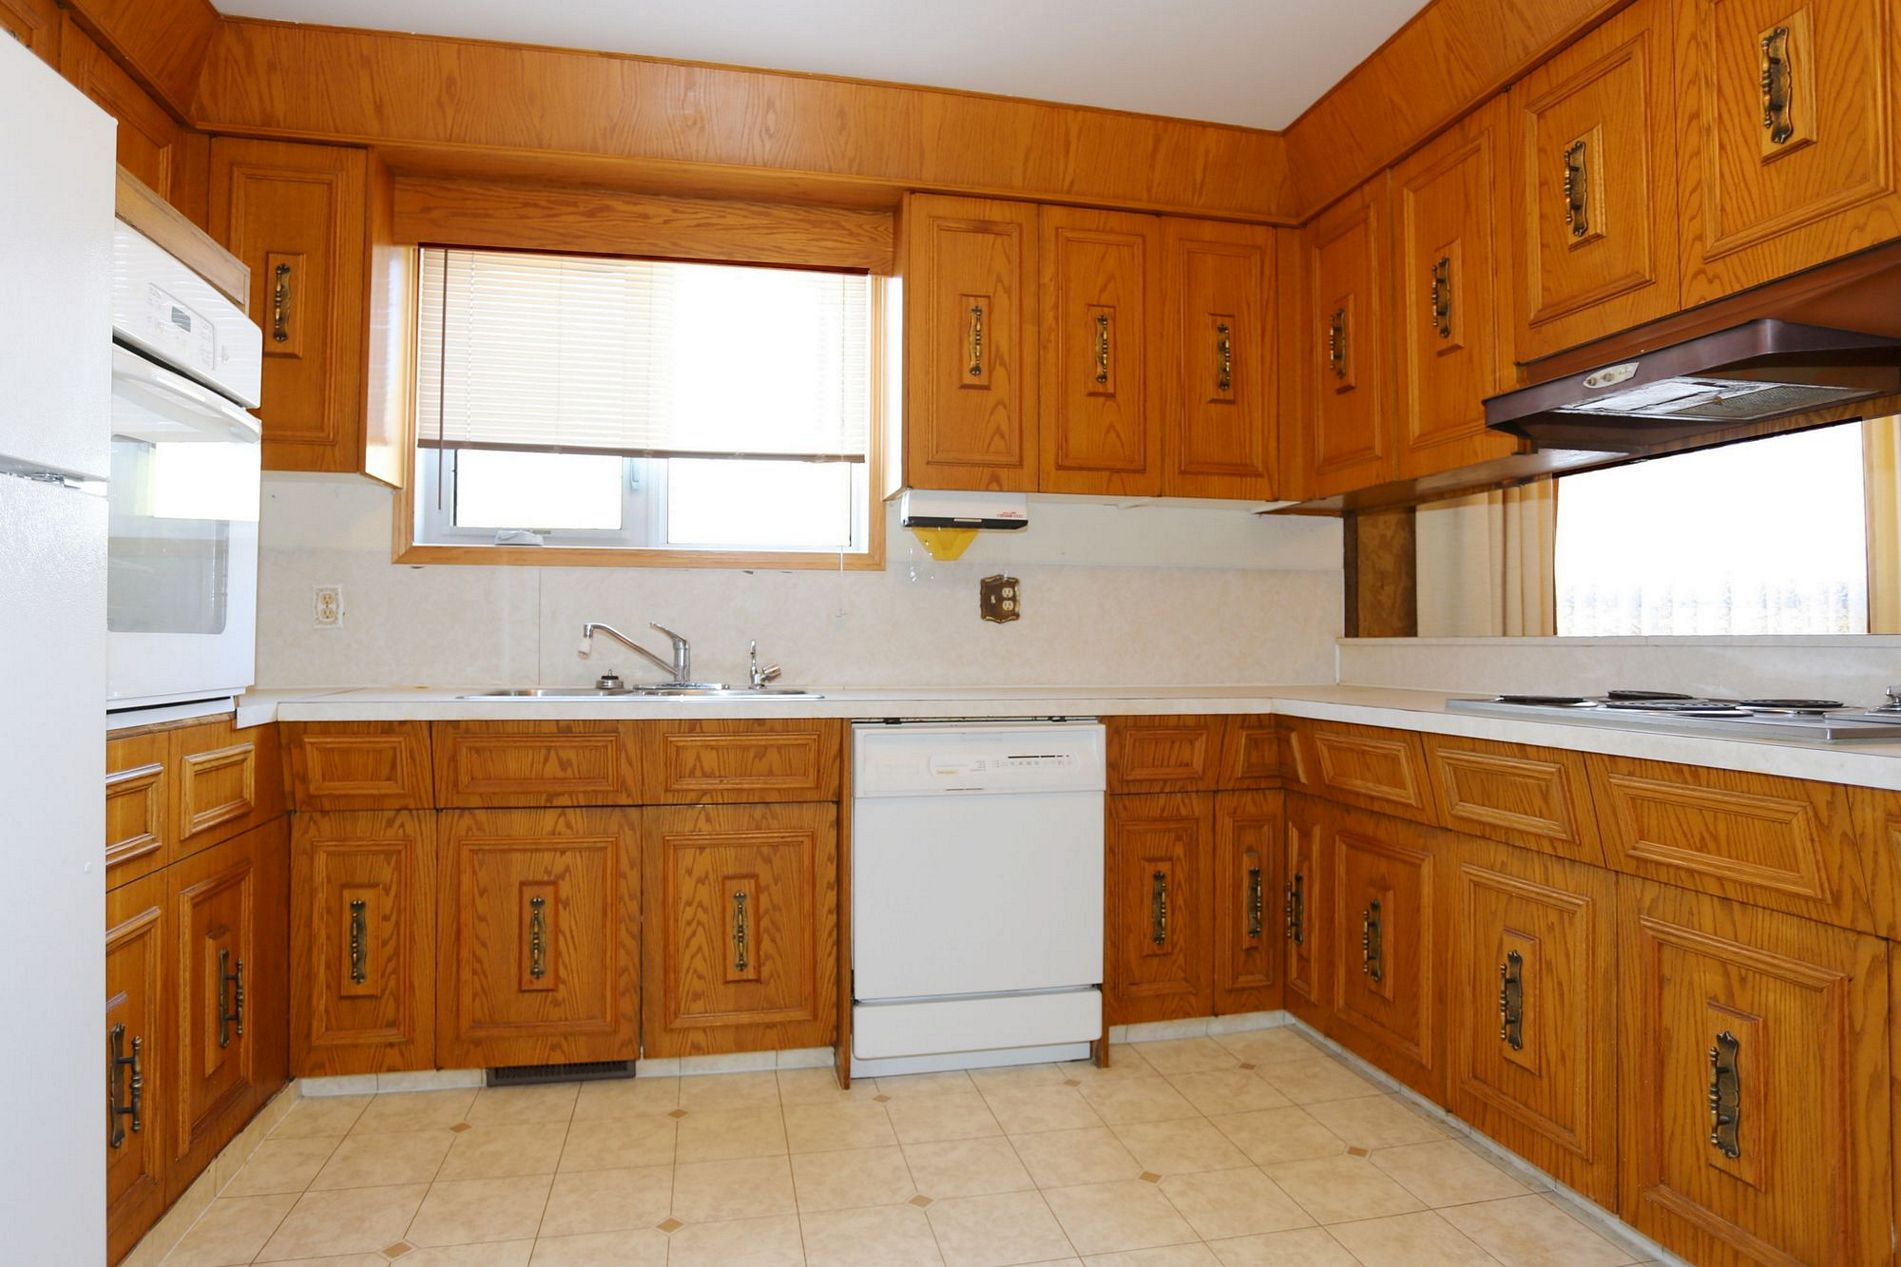 274 Bowman Avenue, Winnipeg, Manitoba  R2K 1N9 - Photo 5 - 1607007